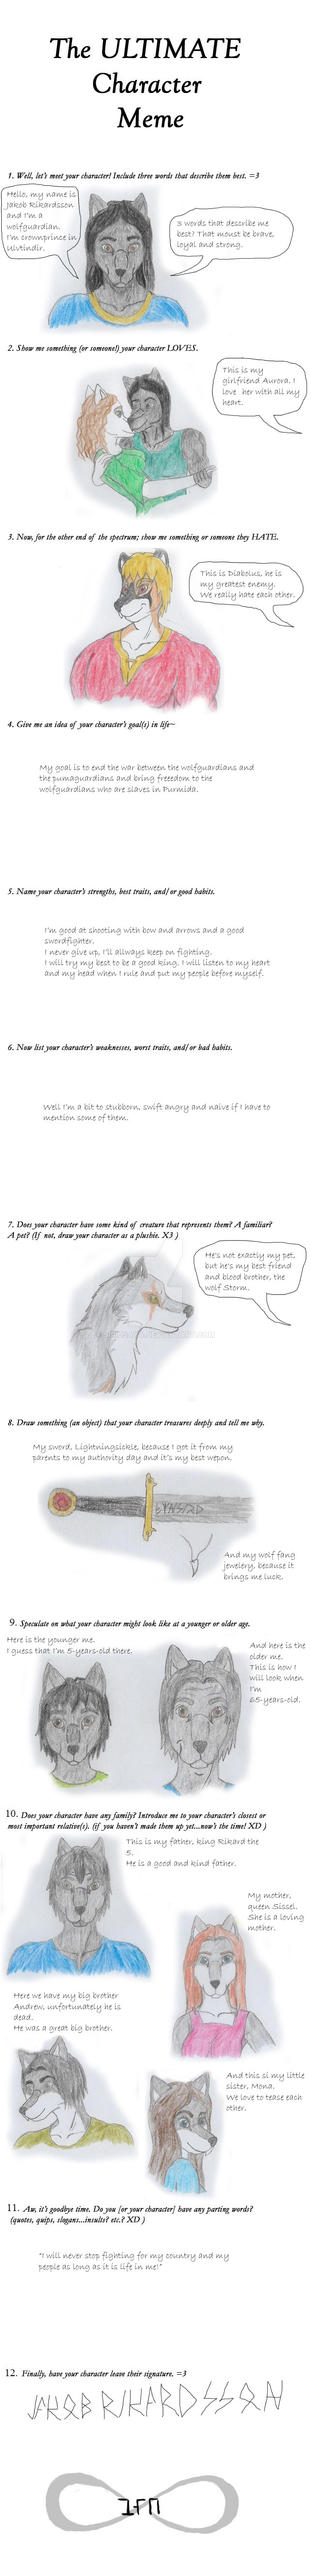 Meme Jakob by Siriusaya